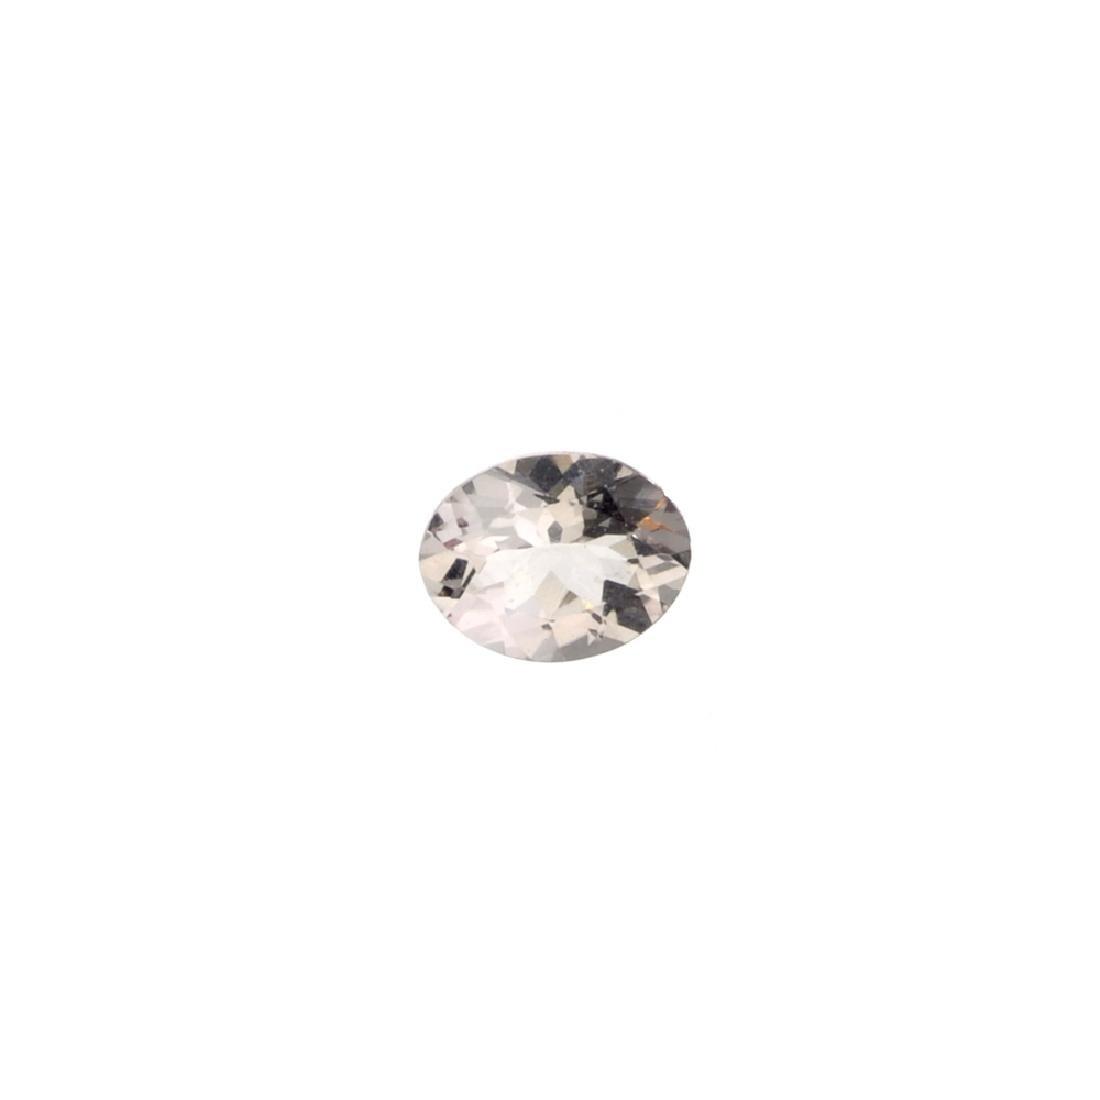 APP: 1k 1.48CT Oval Cut Morganite Gemstone